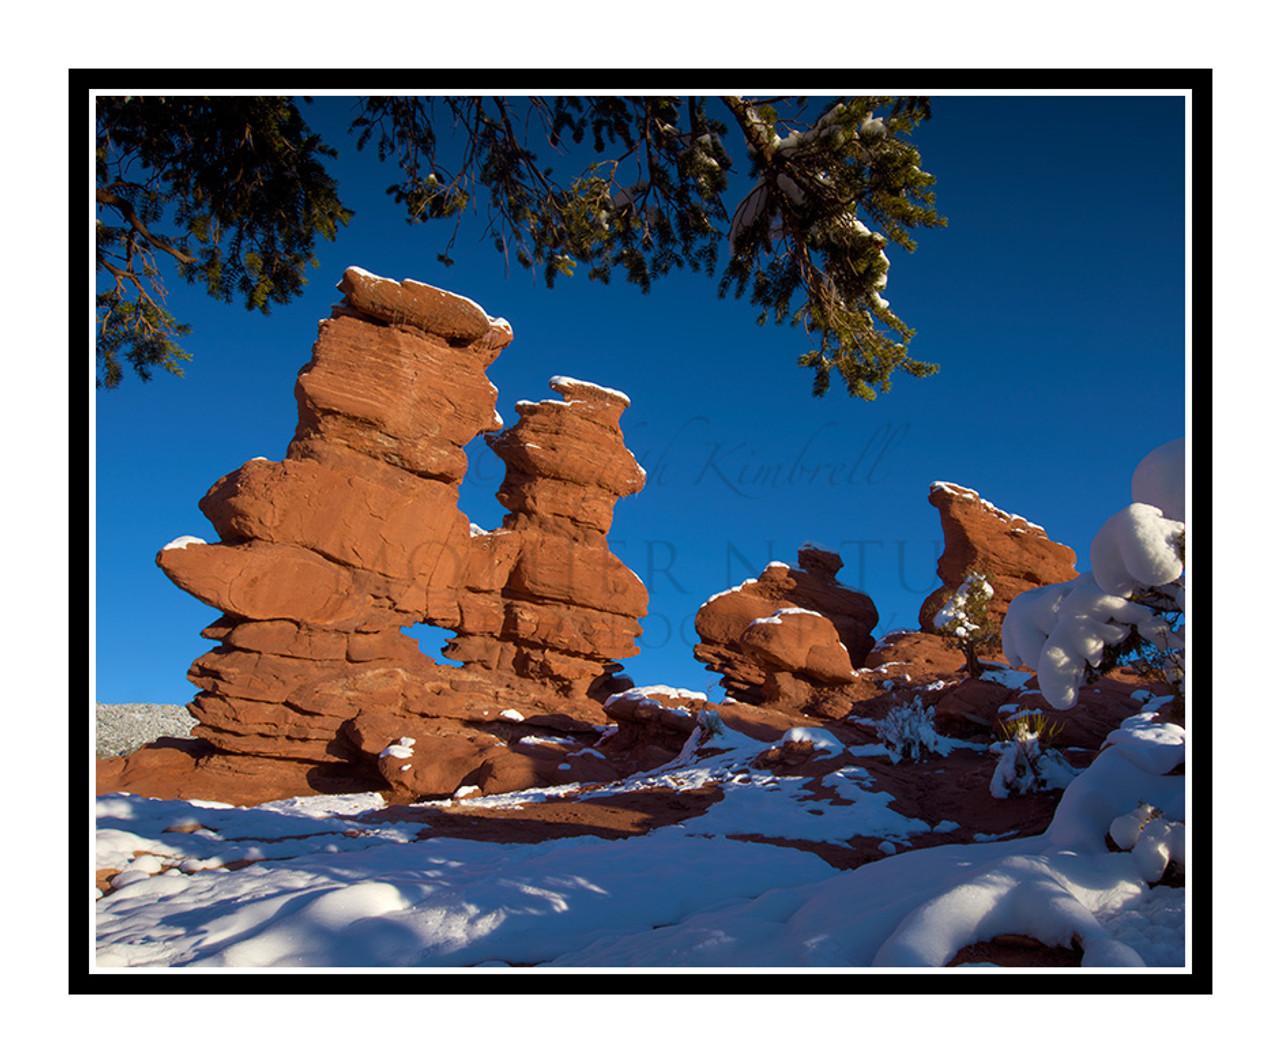 Siamese Twins Covered In Snow In Garden Of The Gods In Colorado Springs Colorado 2423